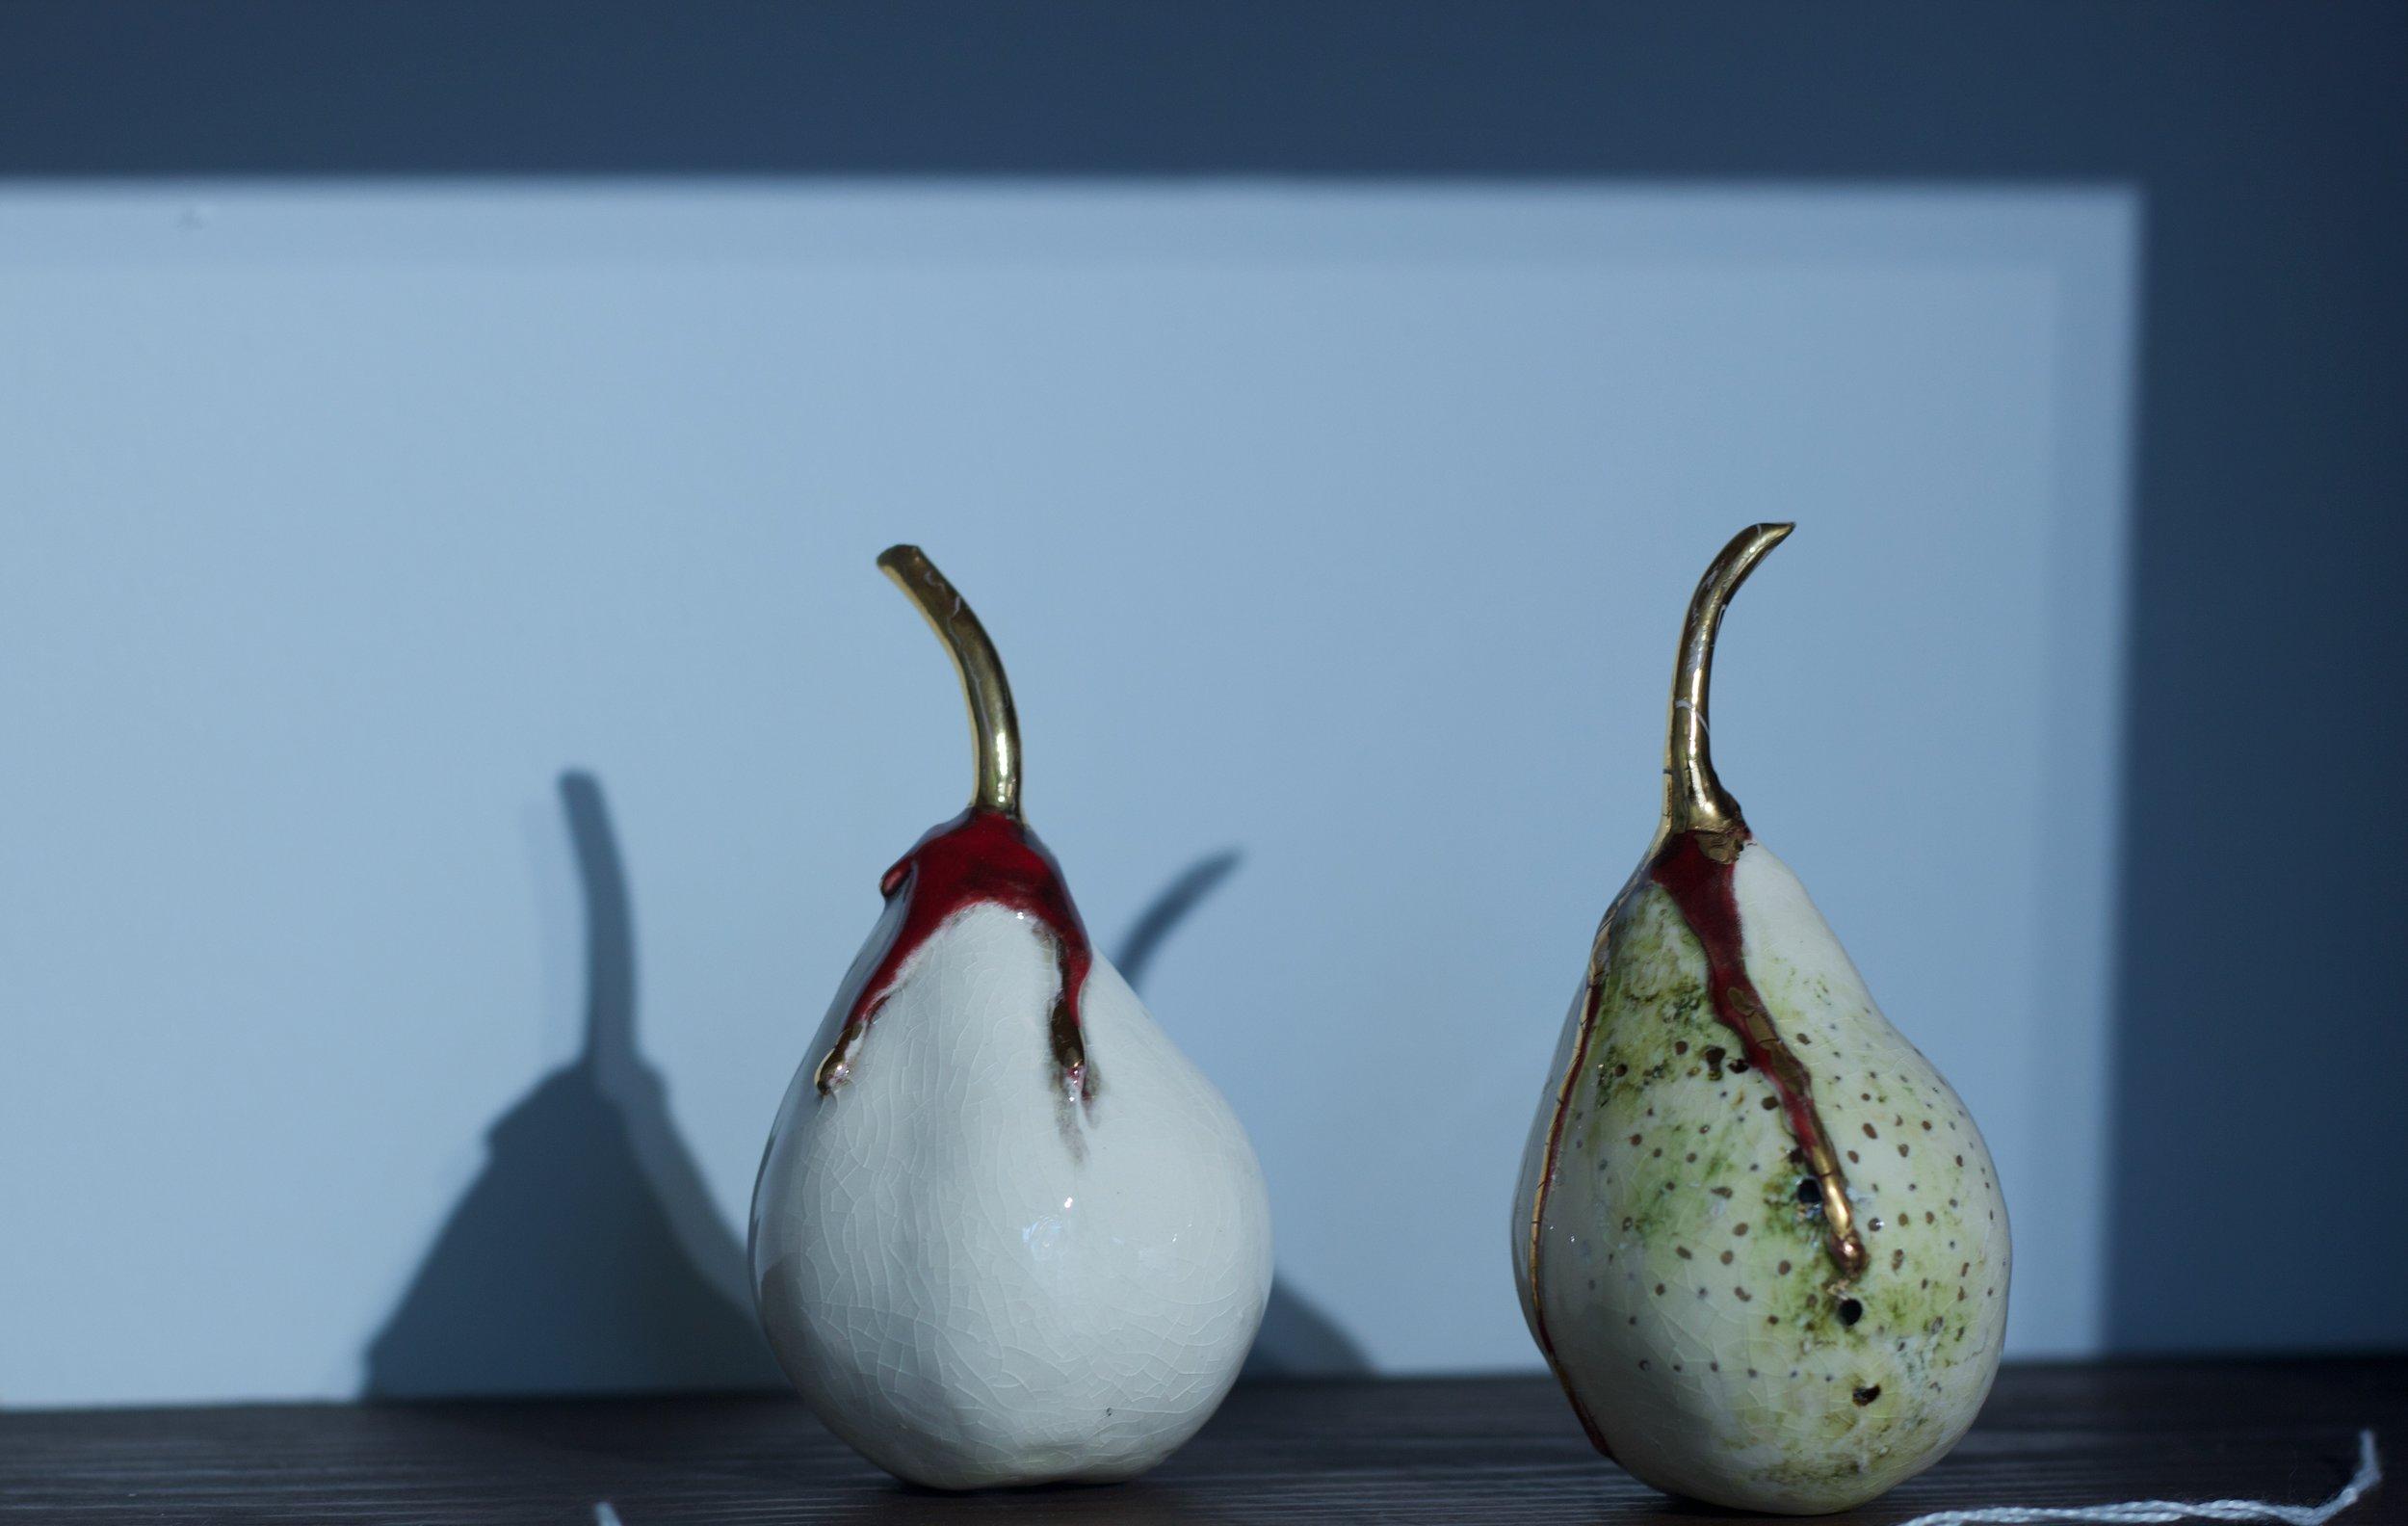 Remon Jephcott - Pears